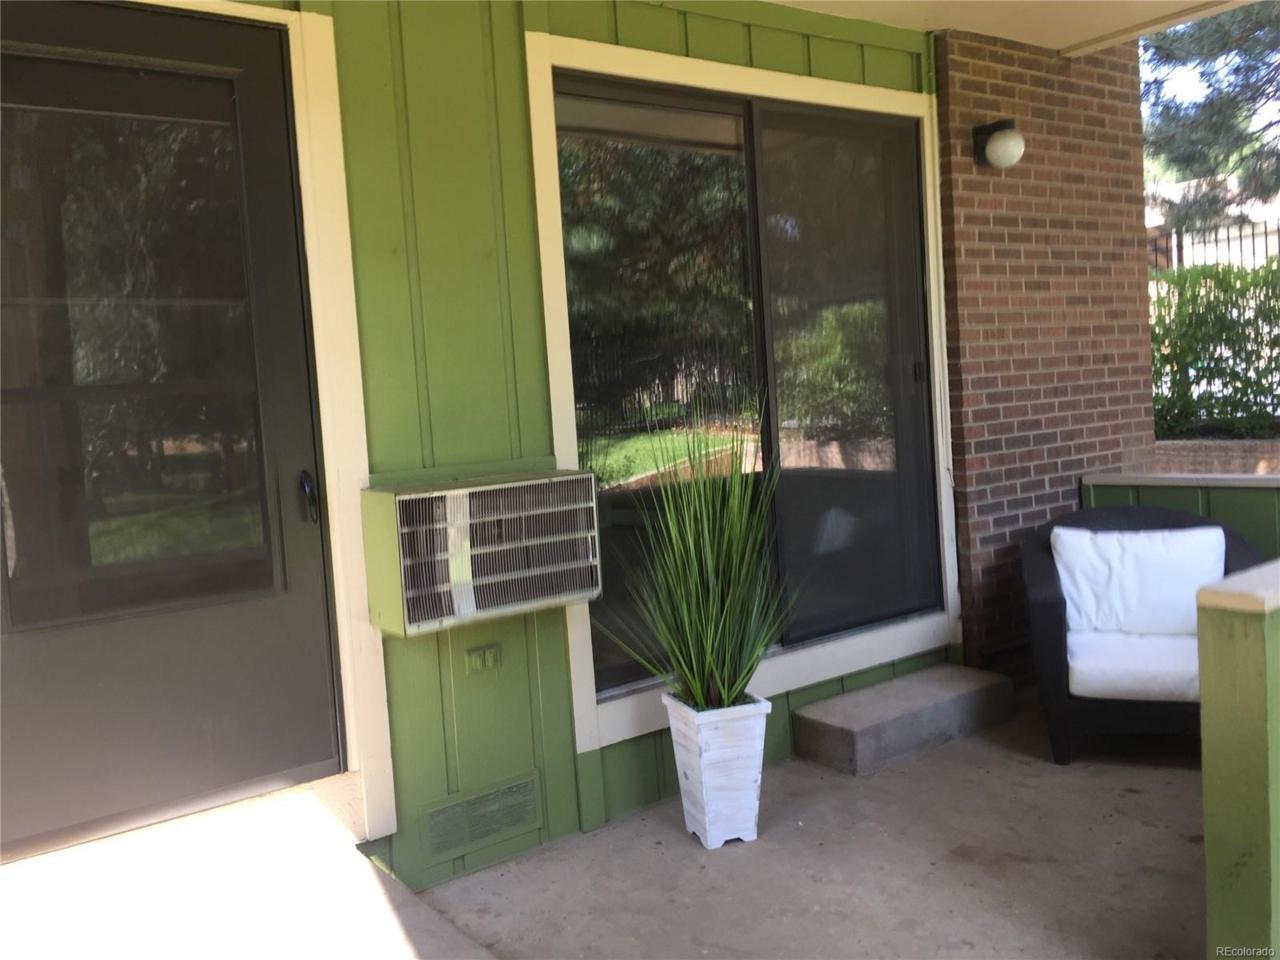 2800 Kalmia Avenue #202, Boulder, CO 80301 (MLS #7544506) :: 8z Real Estate